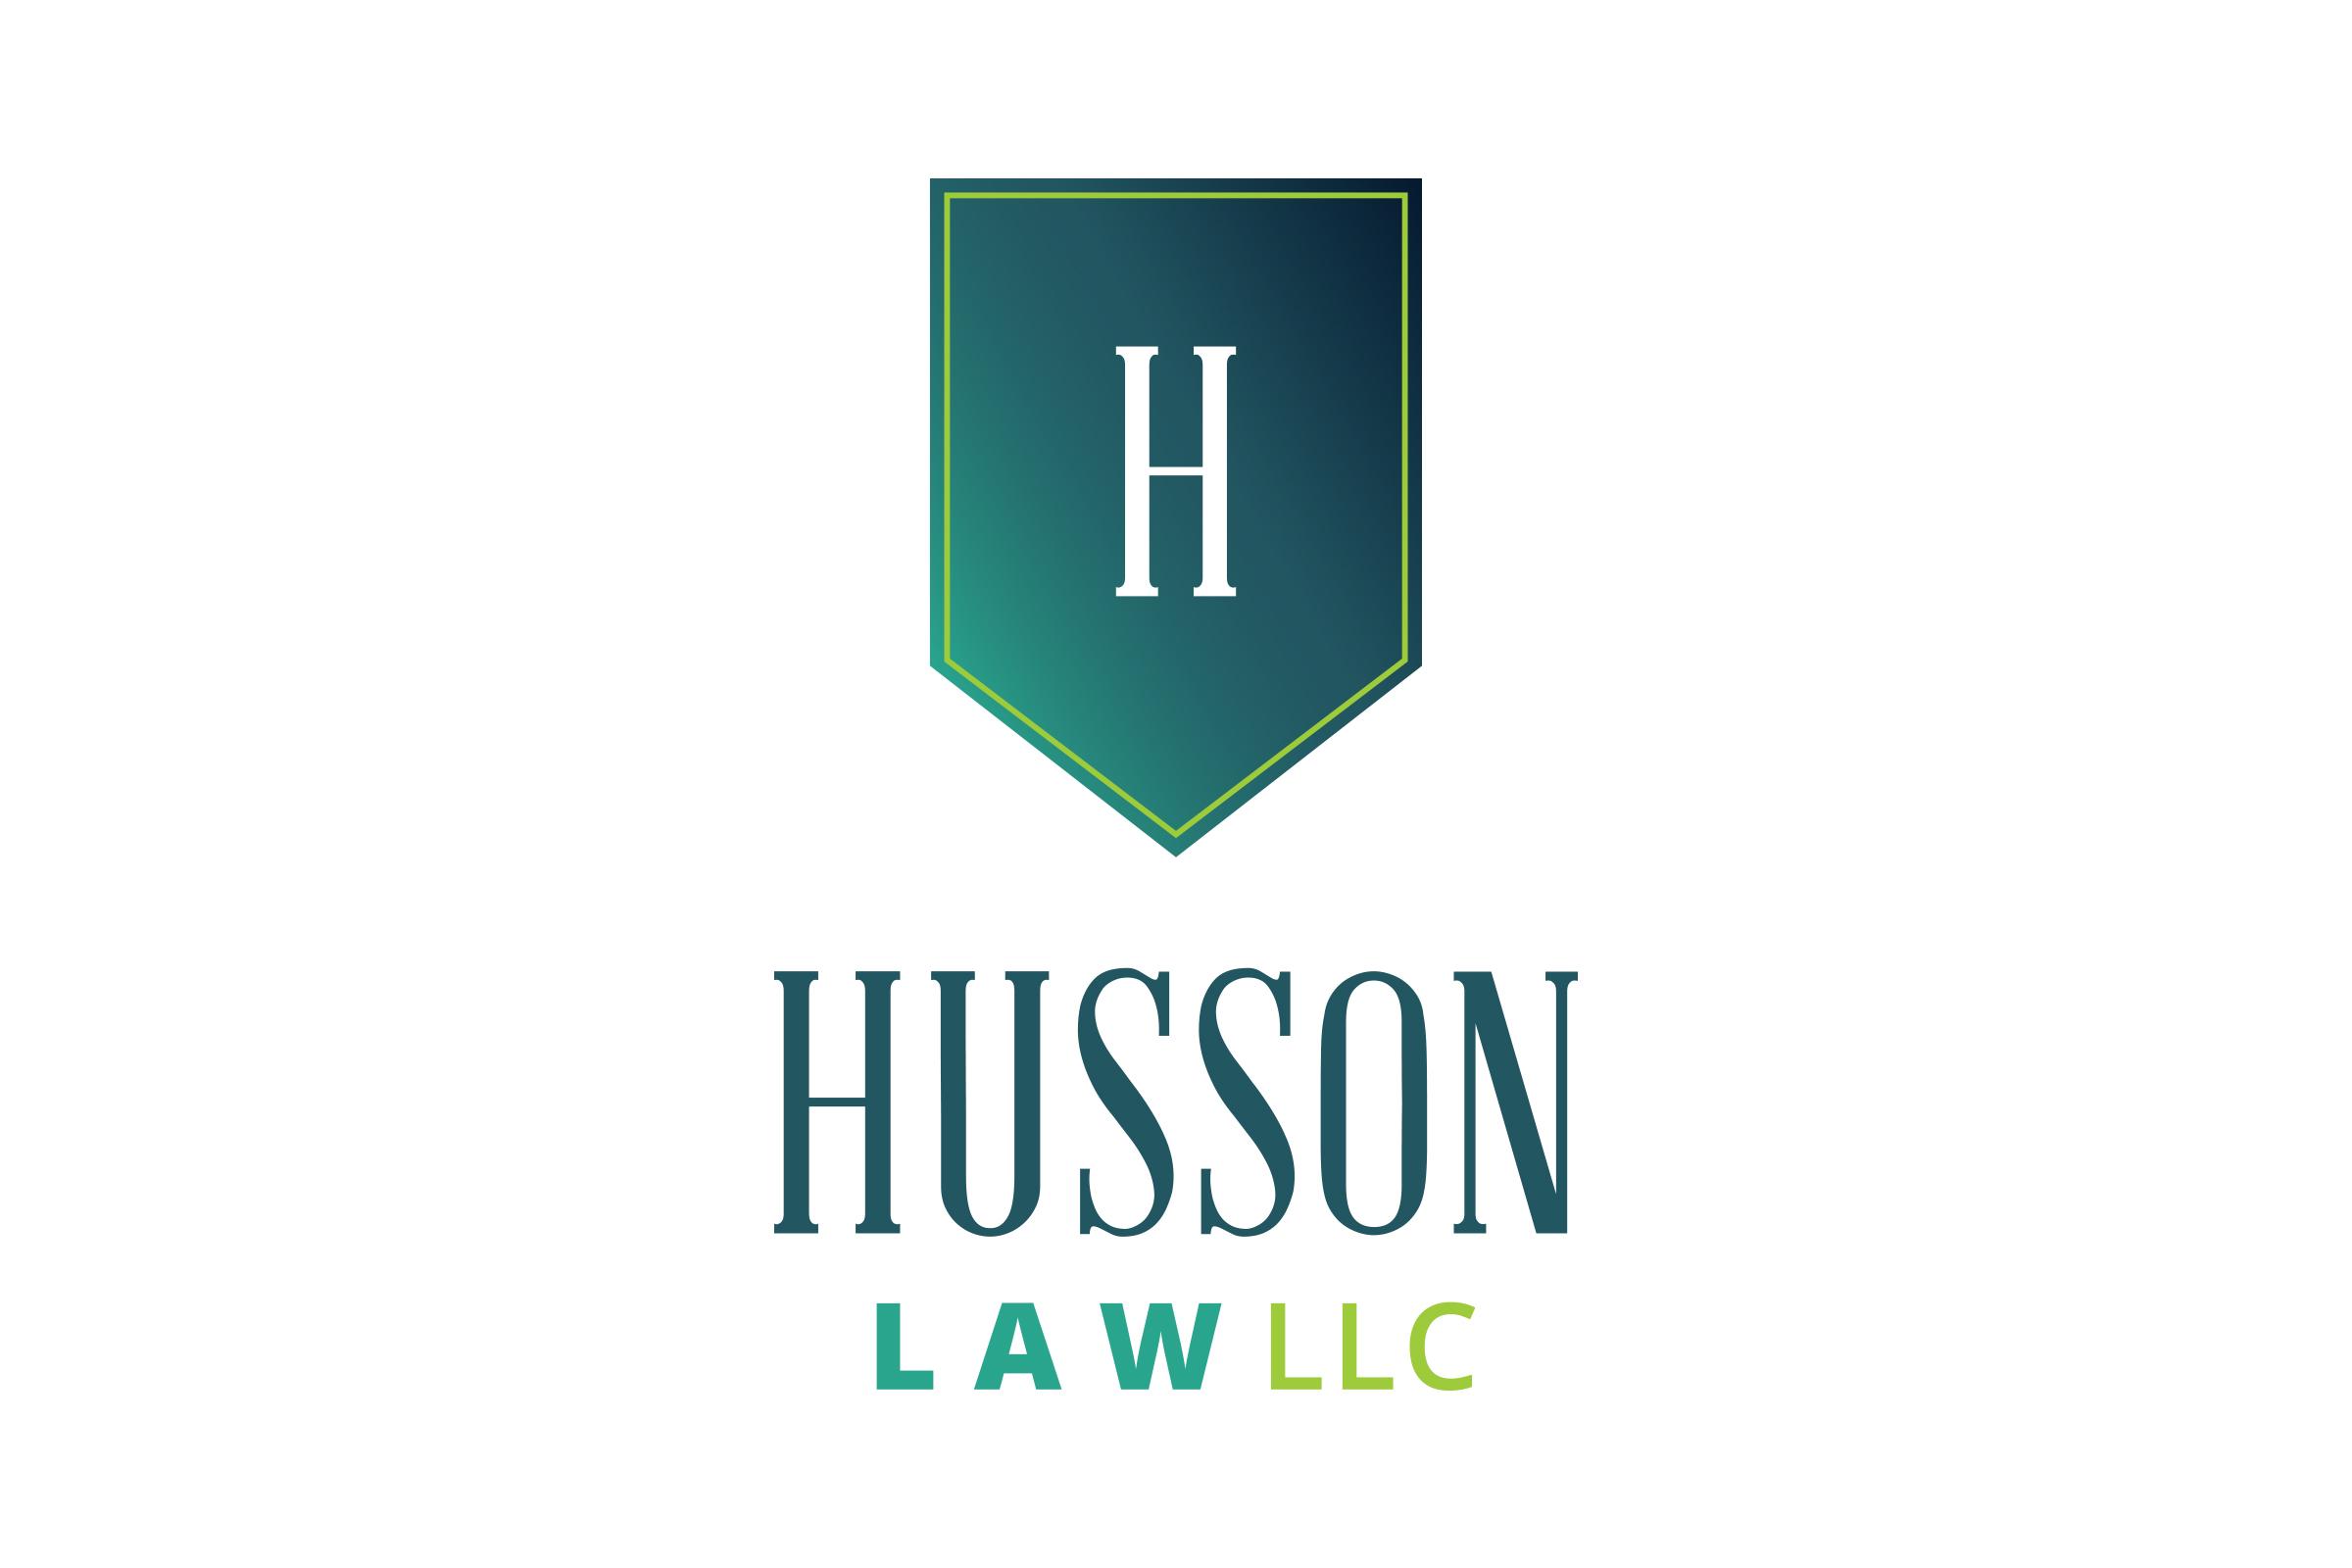 hearthfire-creative-logo-brand-identity-designer-denver-colorado-husson-law-3.jpg